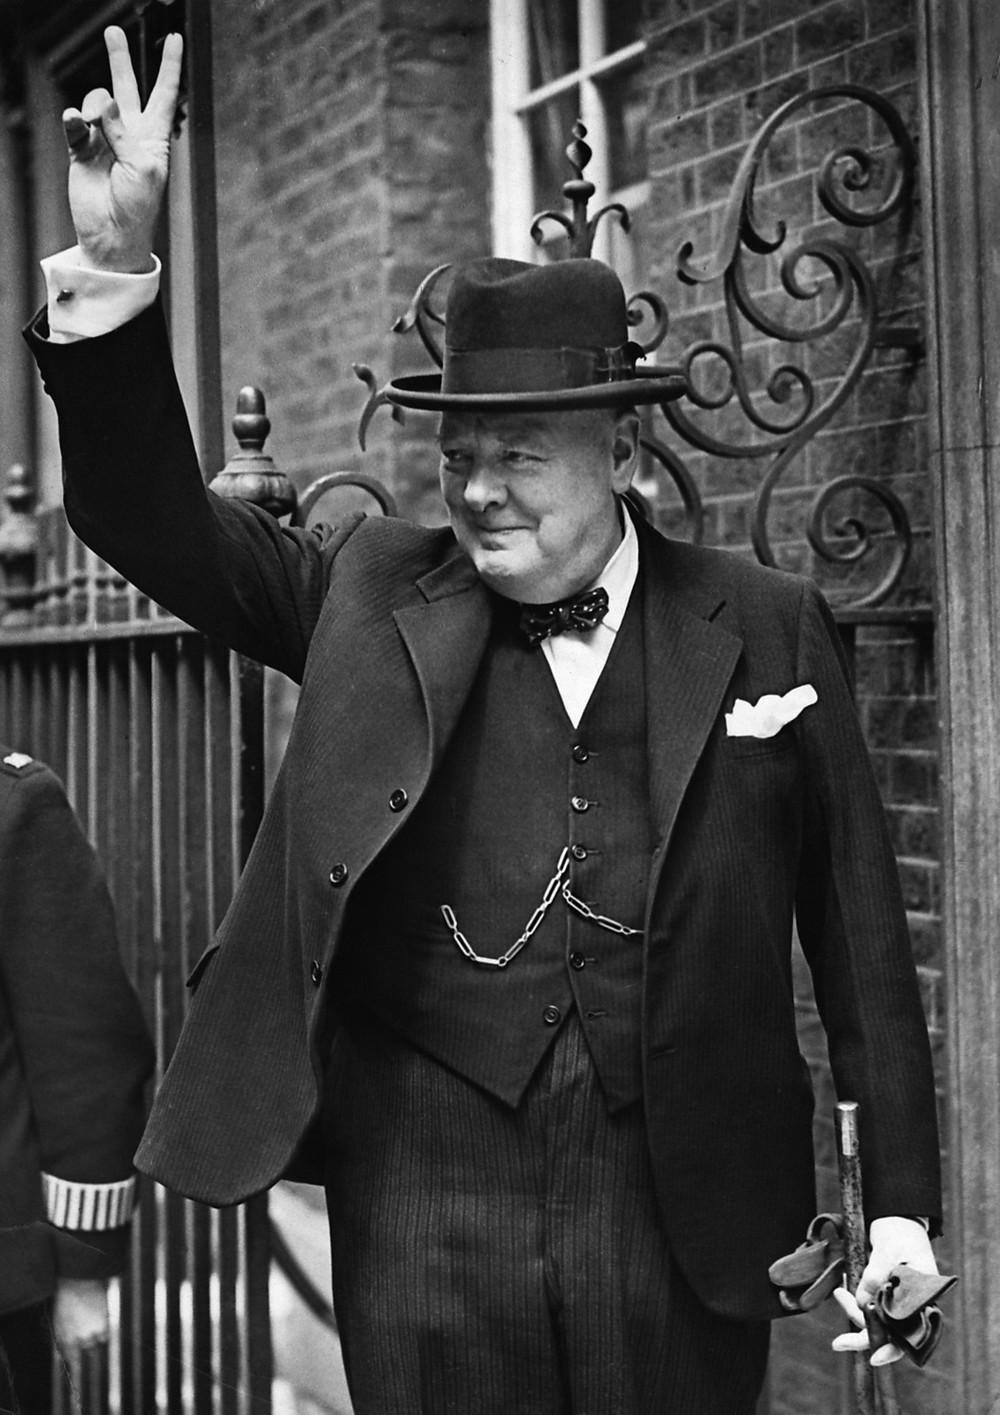 BBC's 1941 'V for Victory' campaign, Winston Churchill promotes